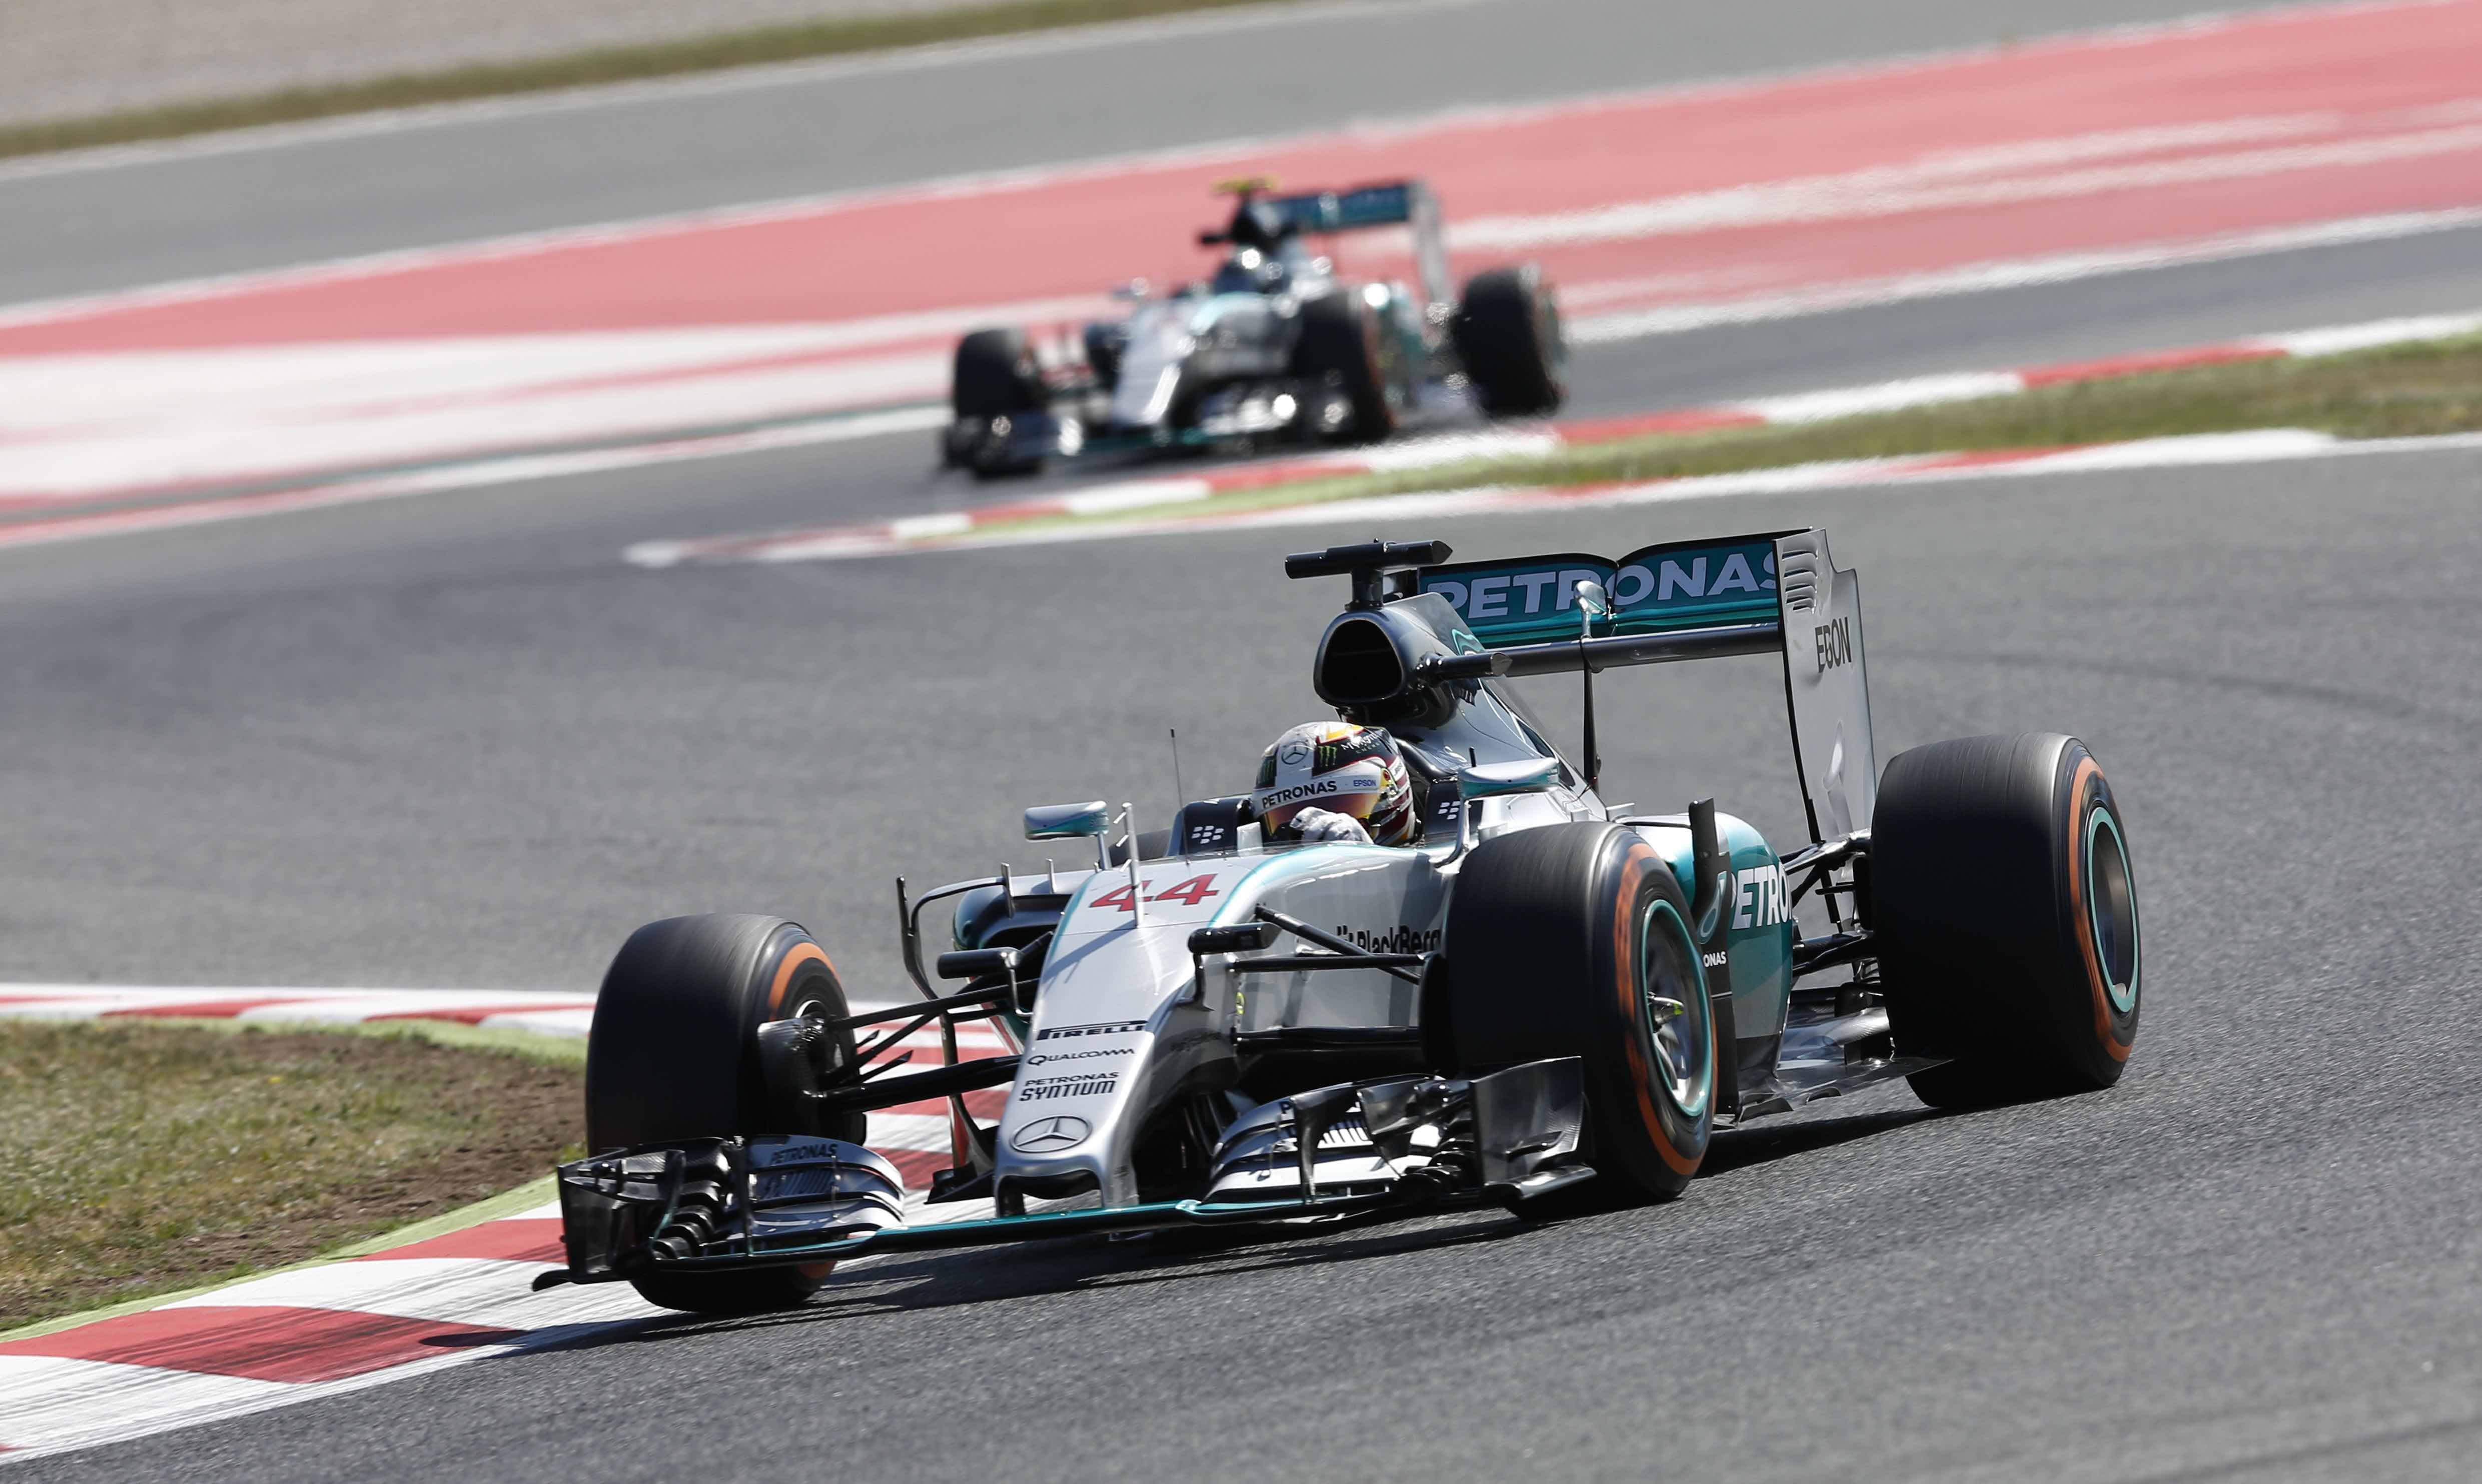 Lewis Hamilton Mercedes GP 2015 Spanish Grand Prix.jpg